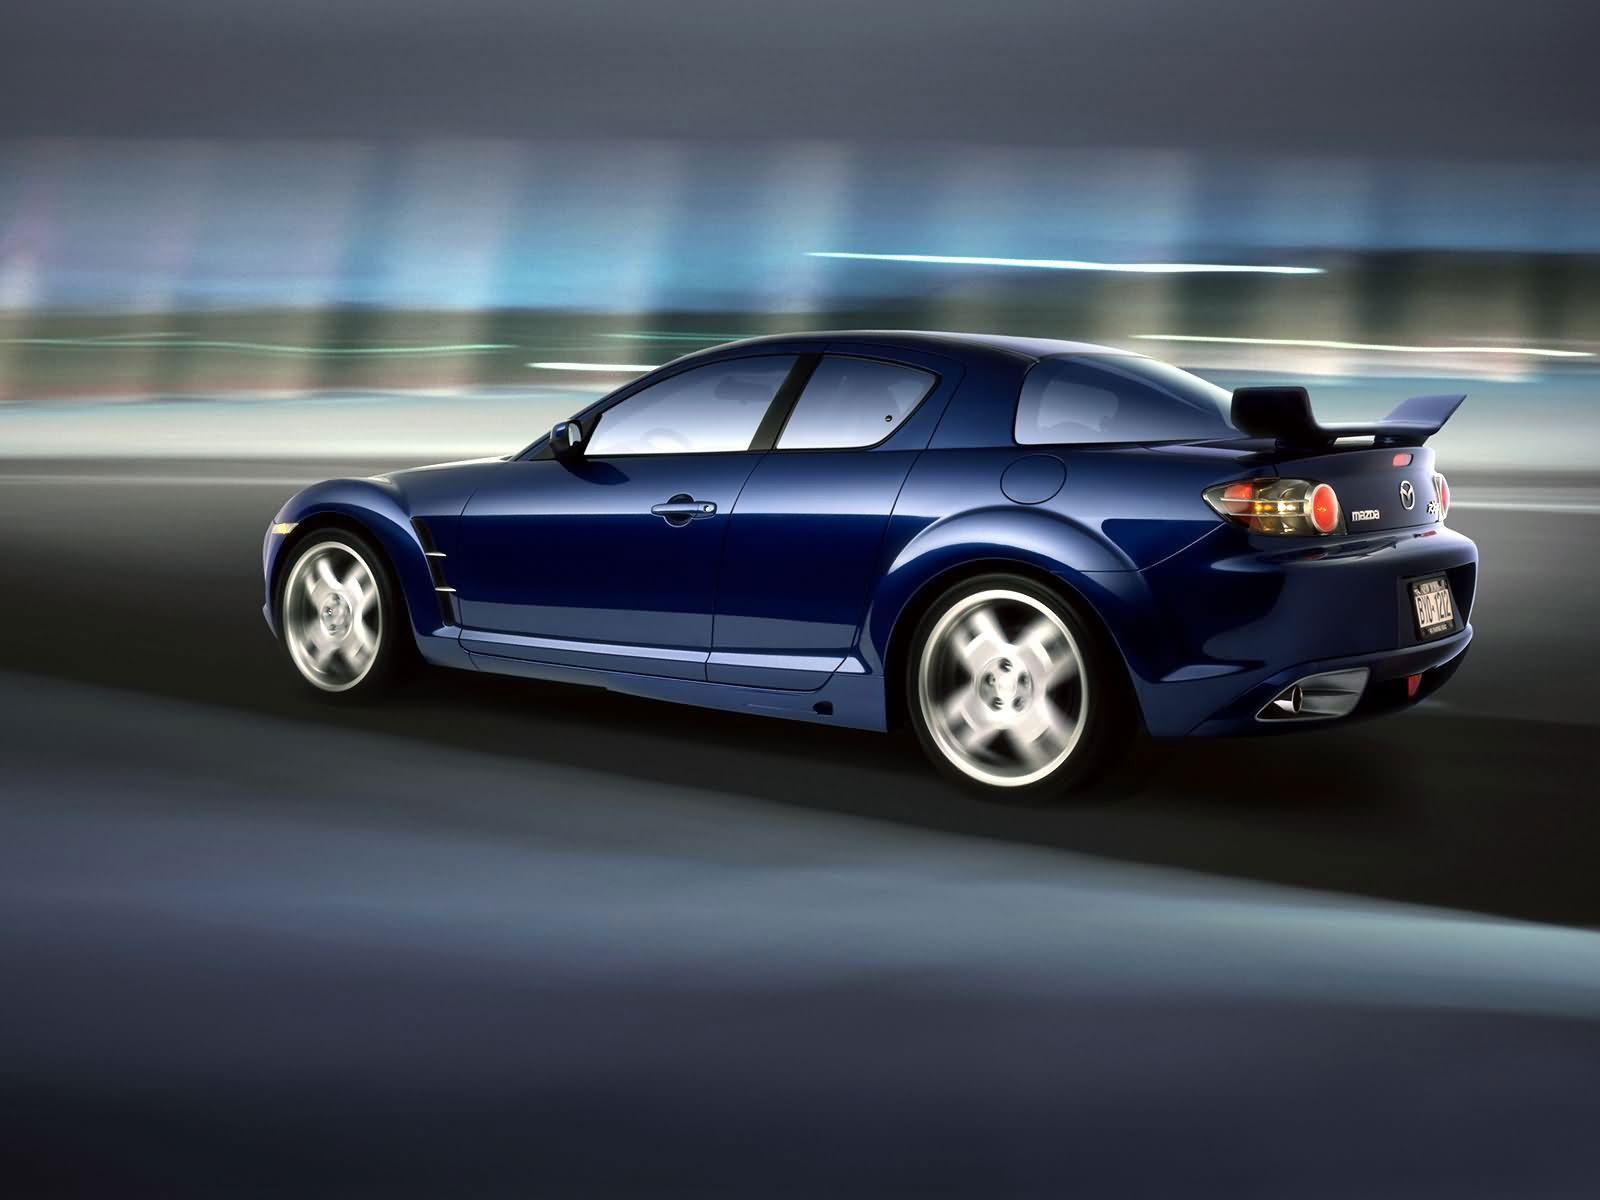 Mazda Rx8 Moving Blurred Background Wallpaper 1600x1200